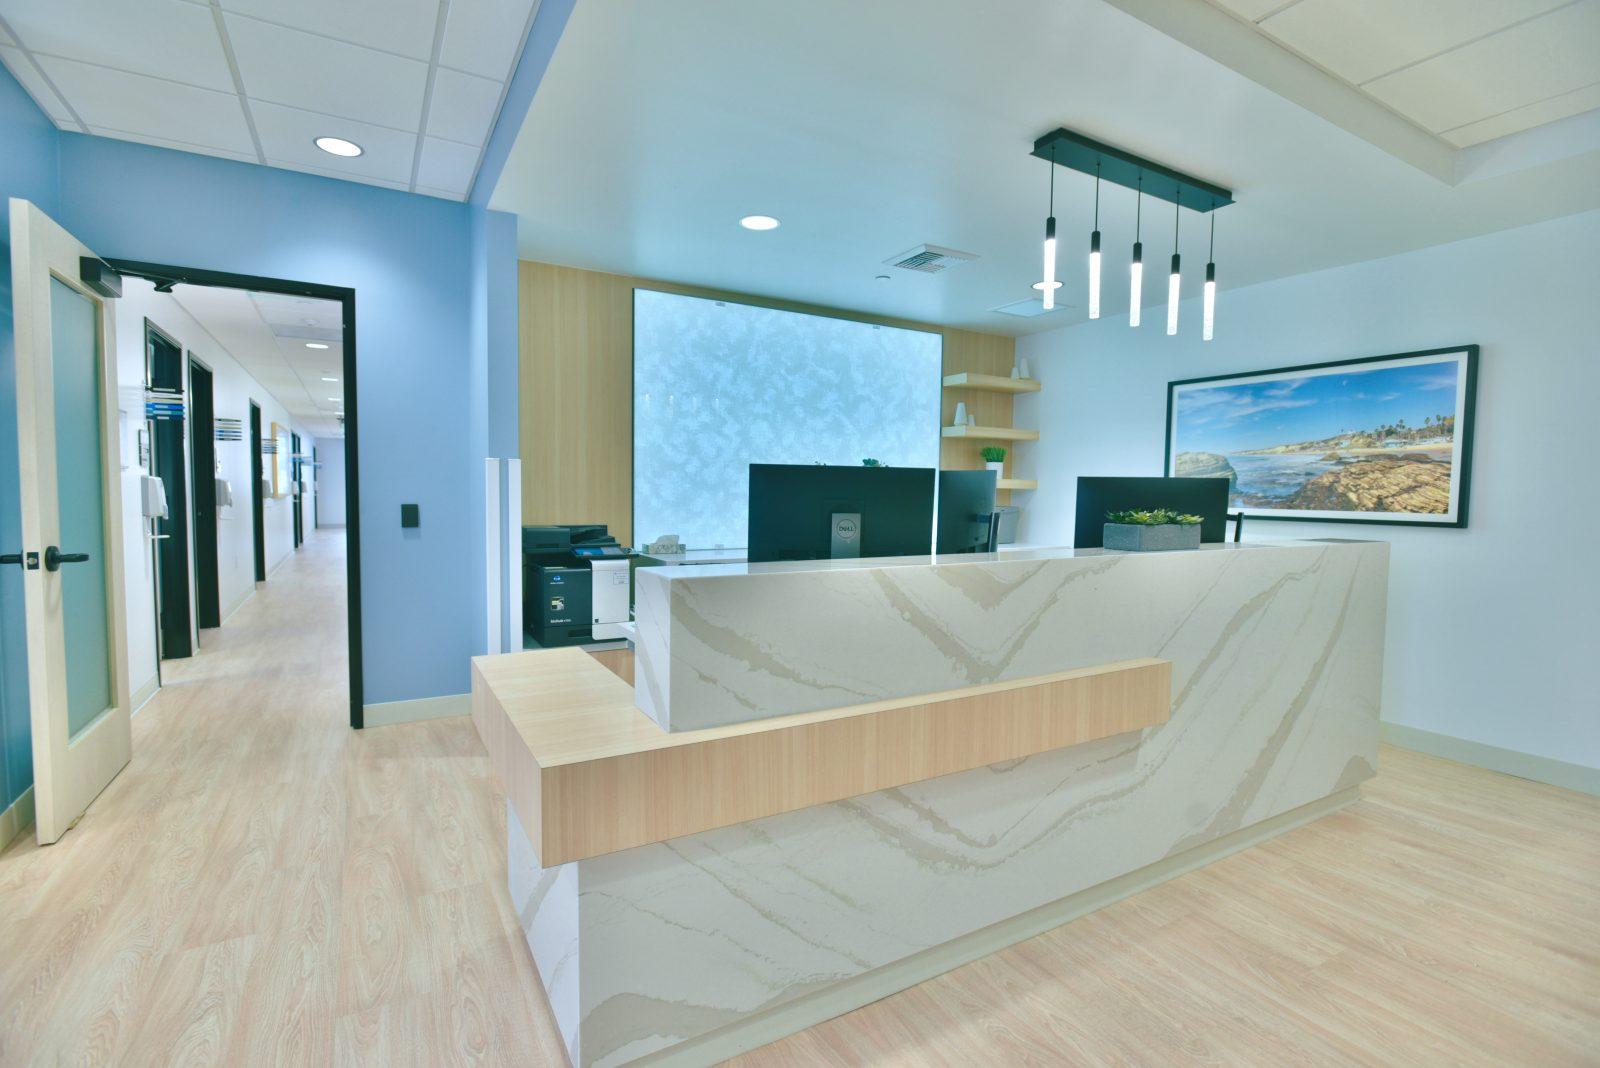 Hoag Internal Medicine Newport Beach  – Fashion Island